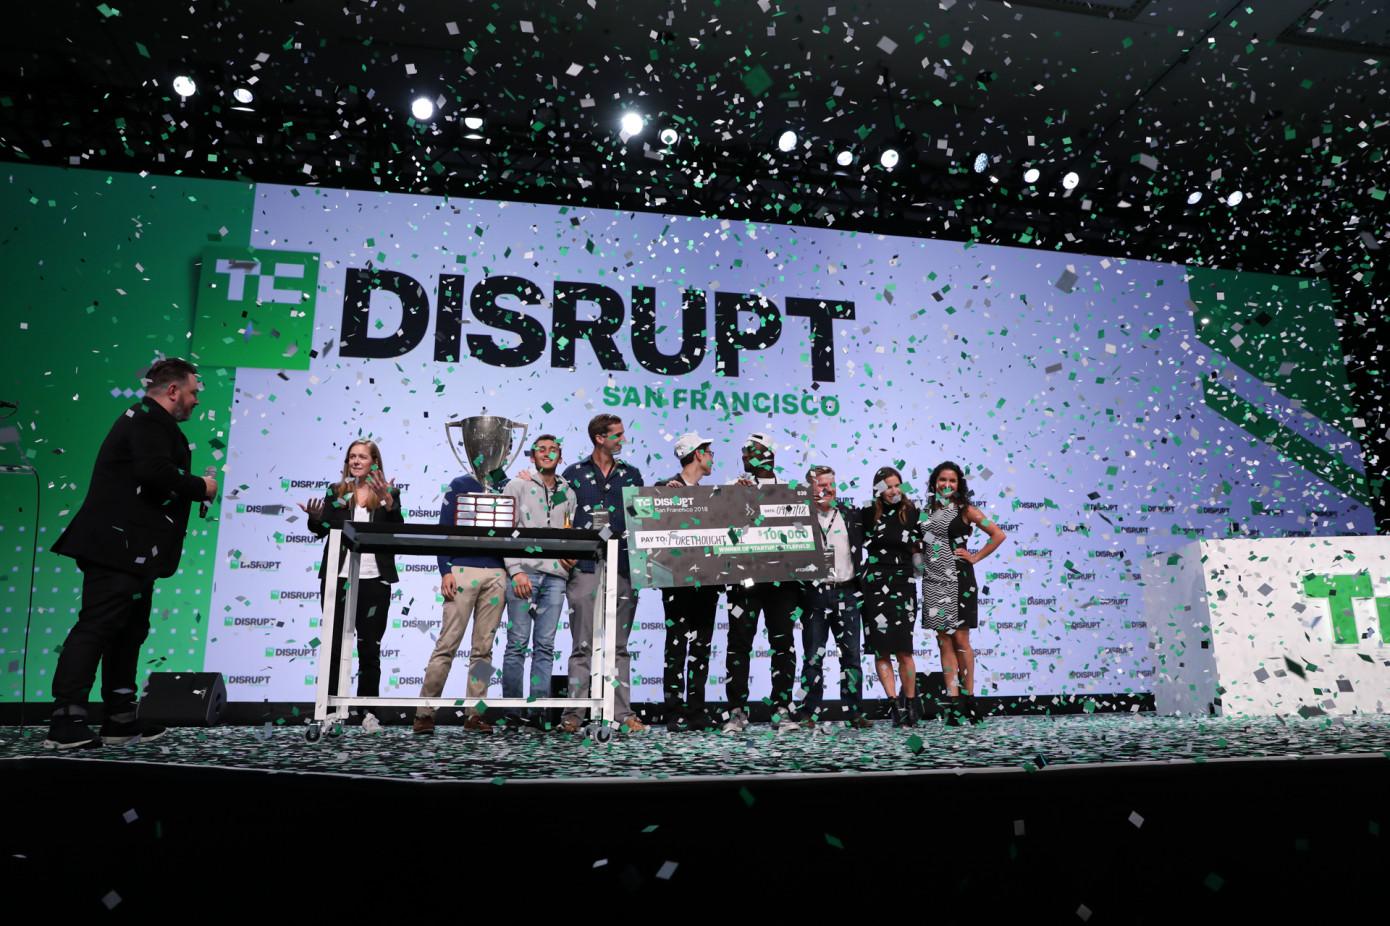 Disrupt San Francisco